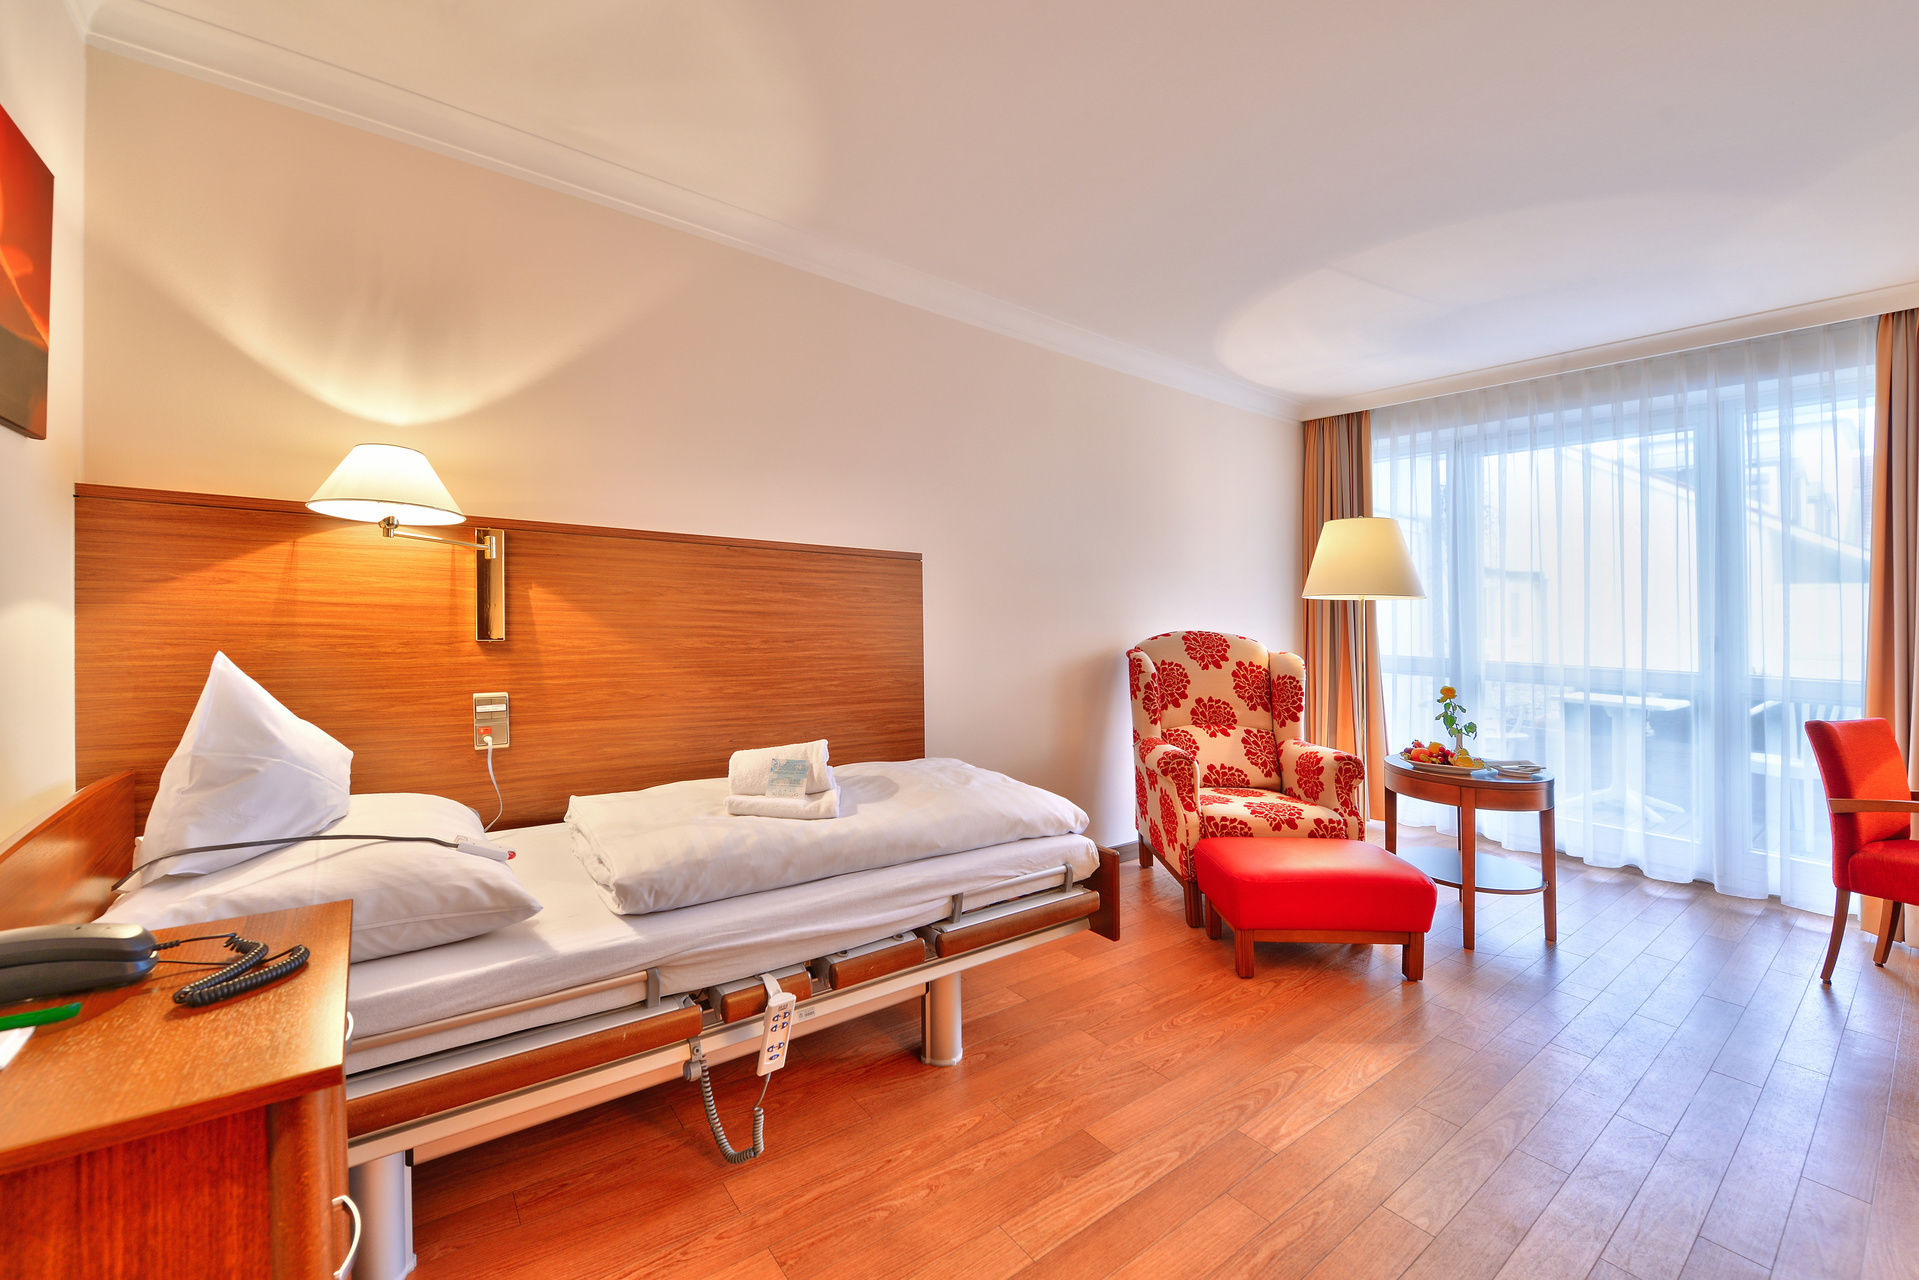 5 Sterne Hotel Und Privatklinik In Bad Griesbach In